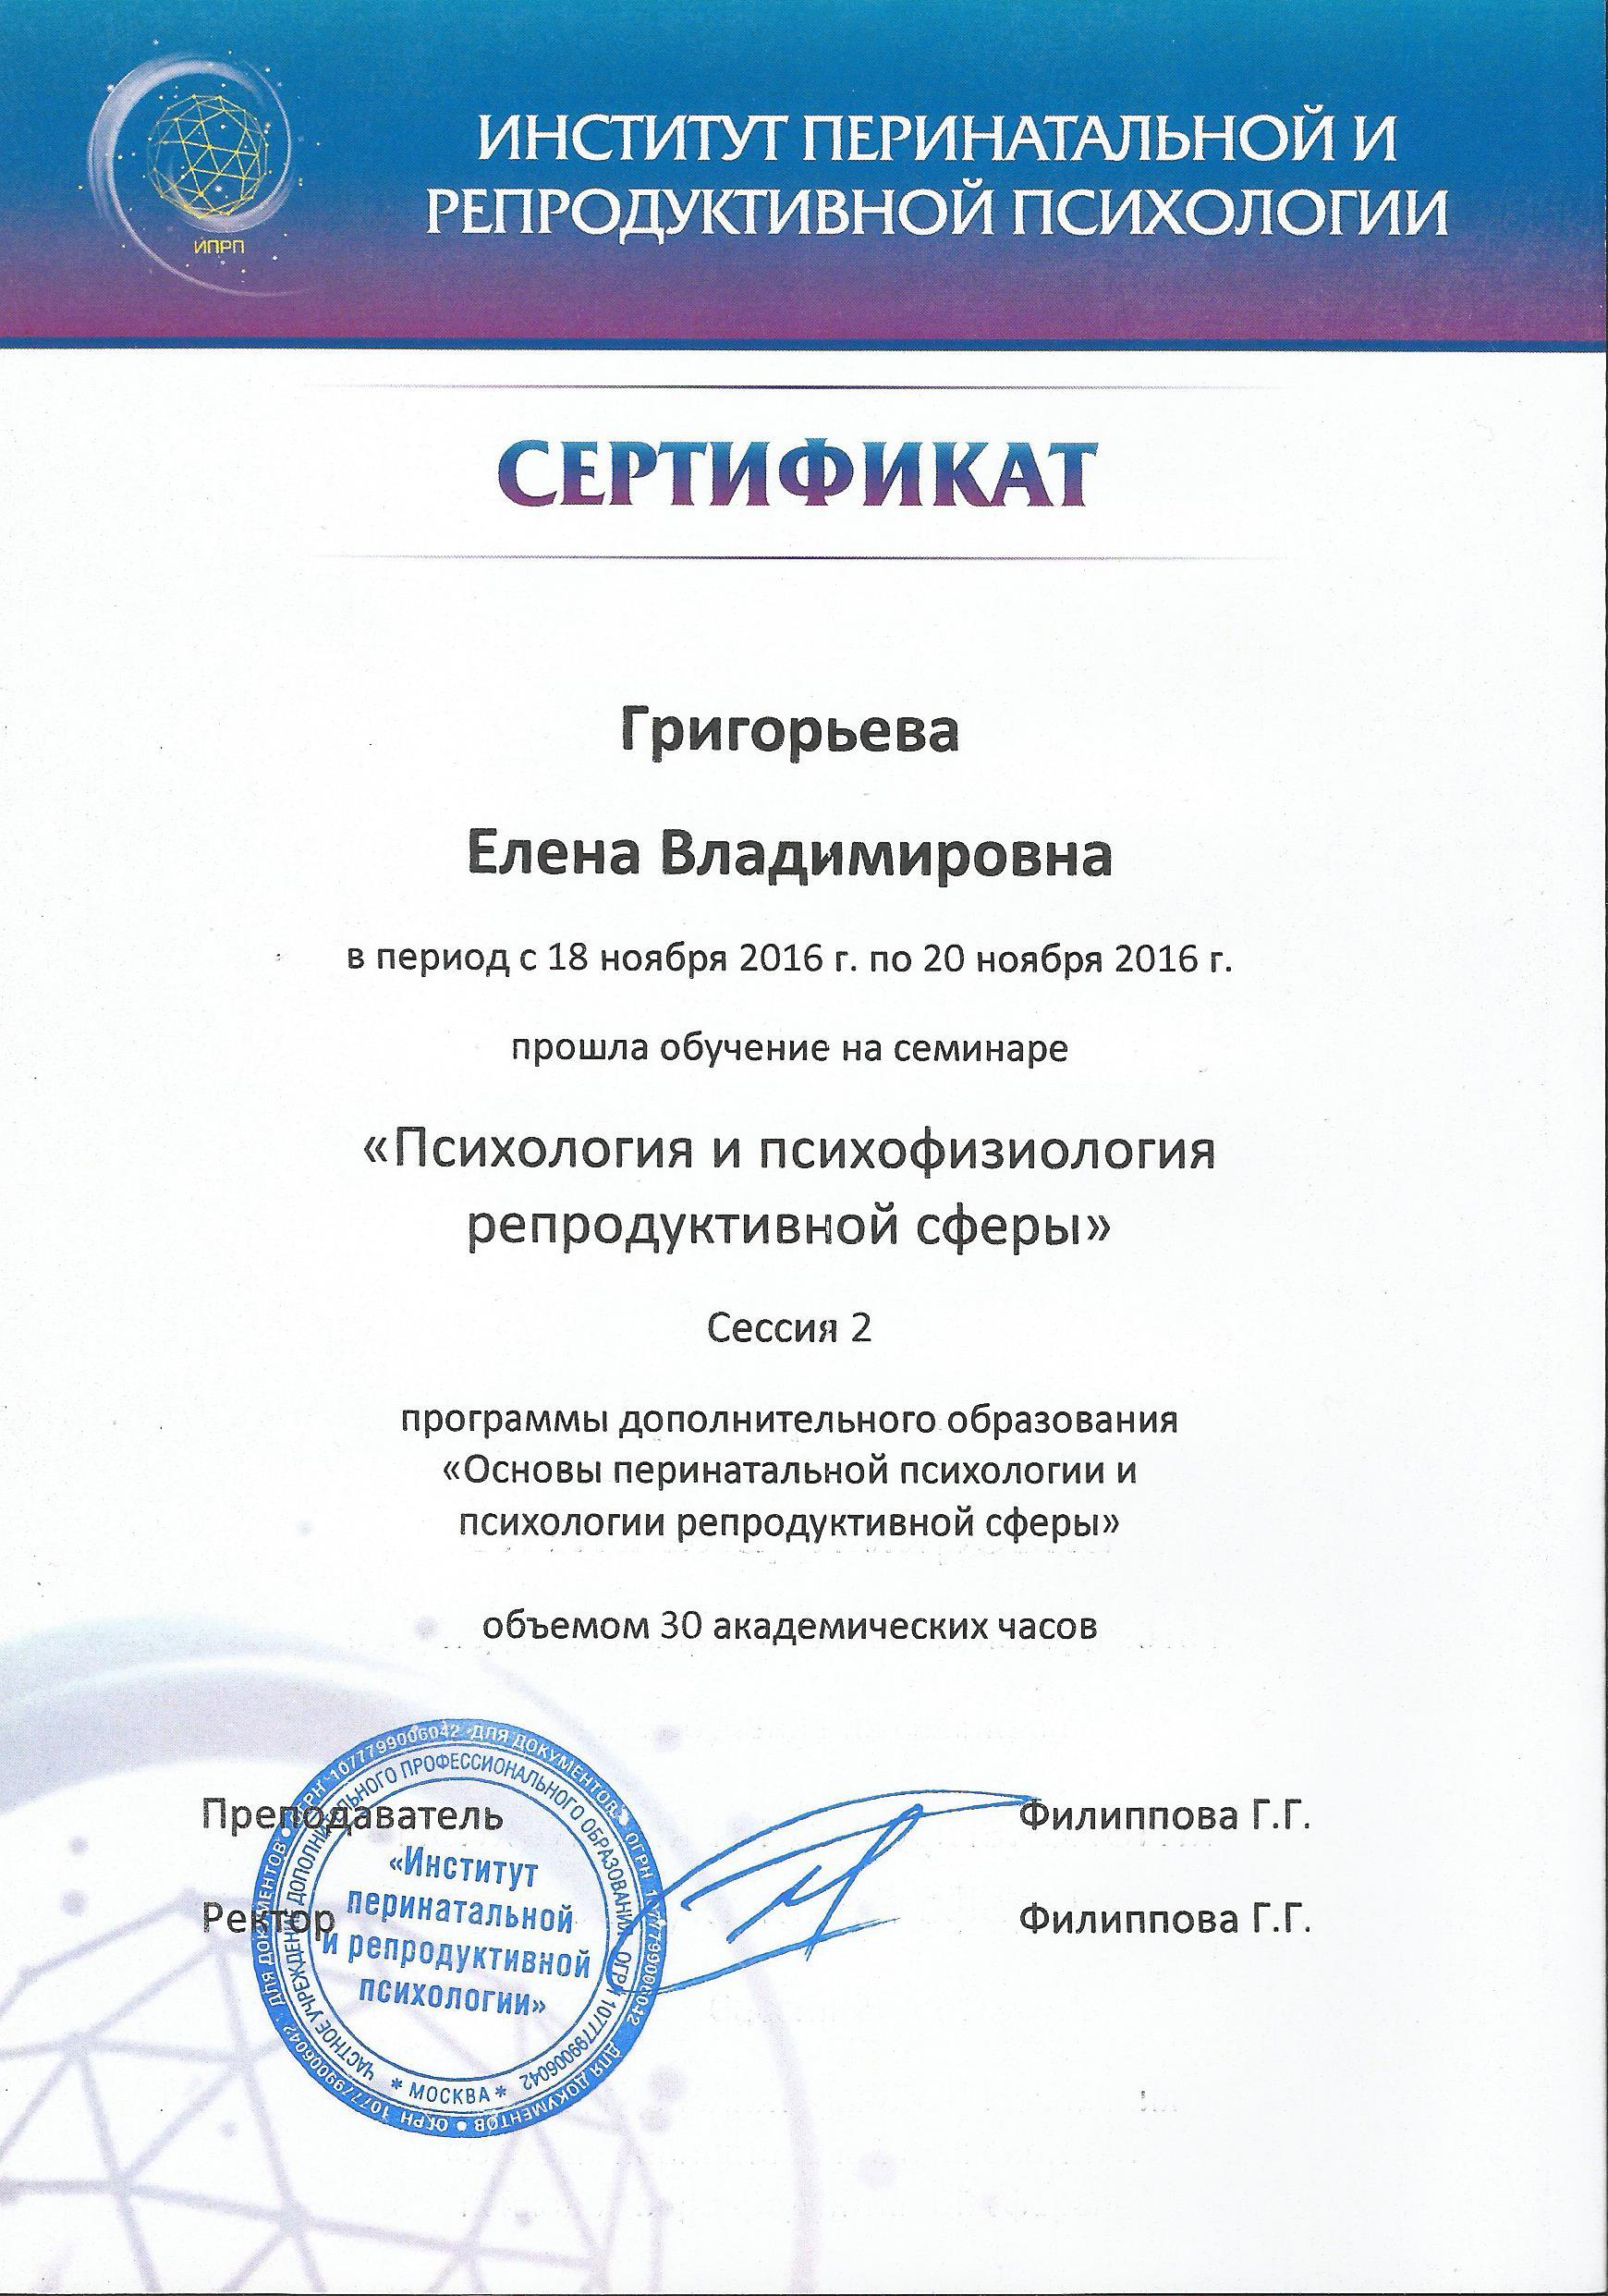 sert-repr-2